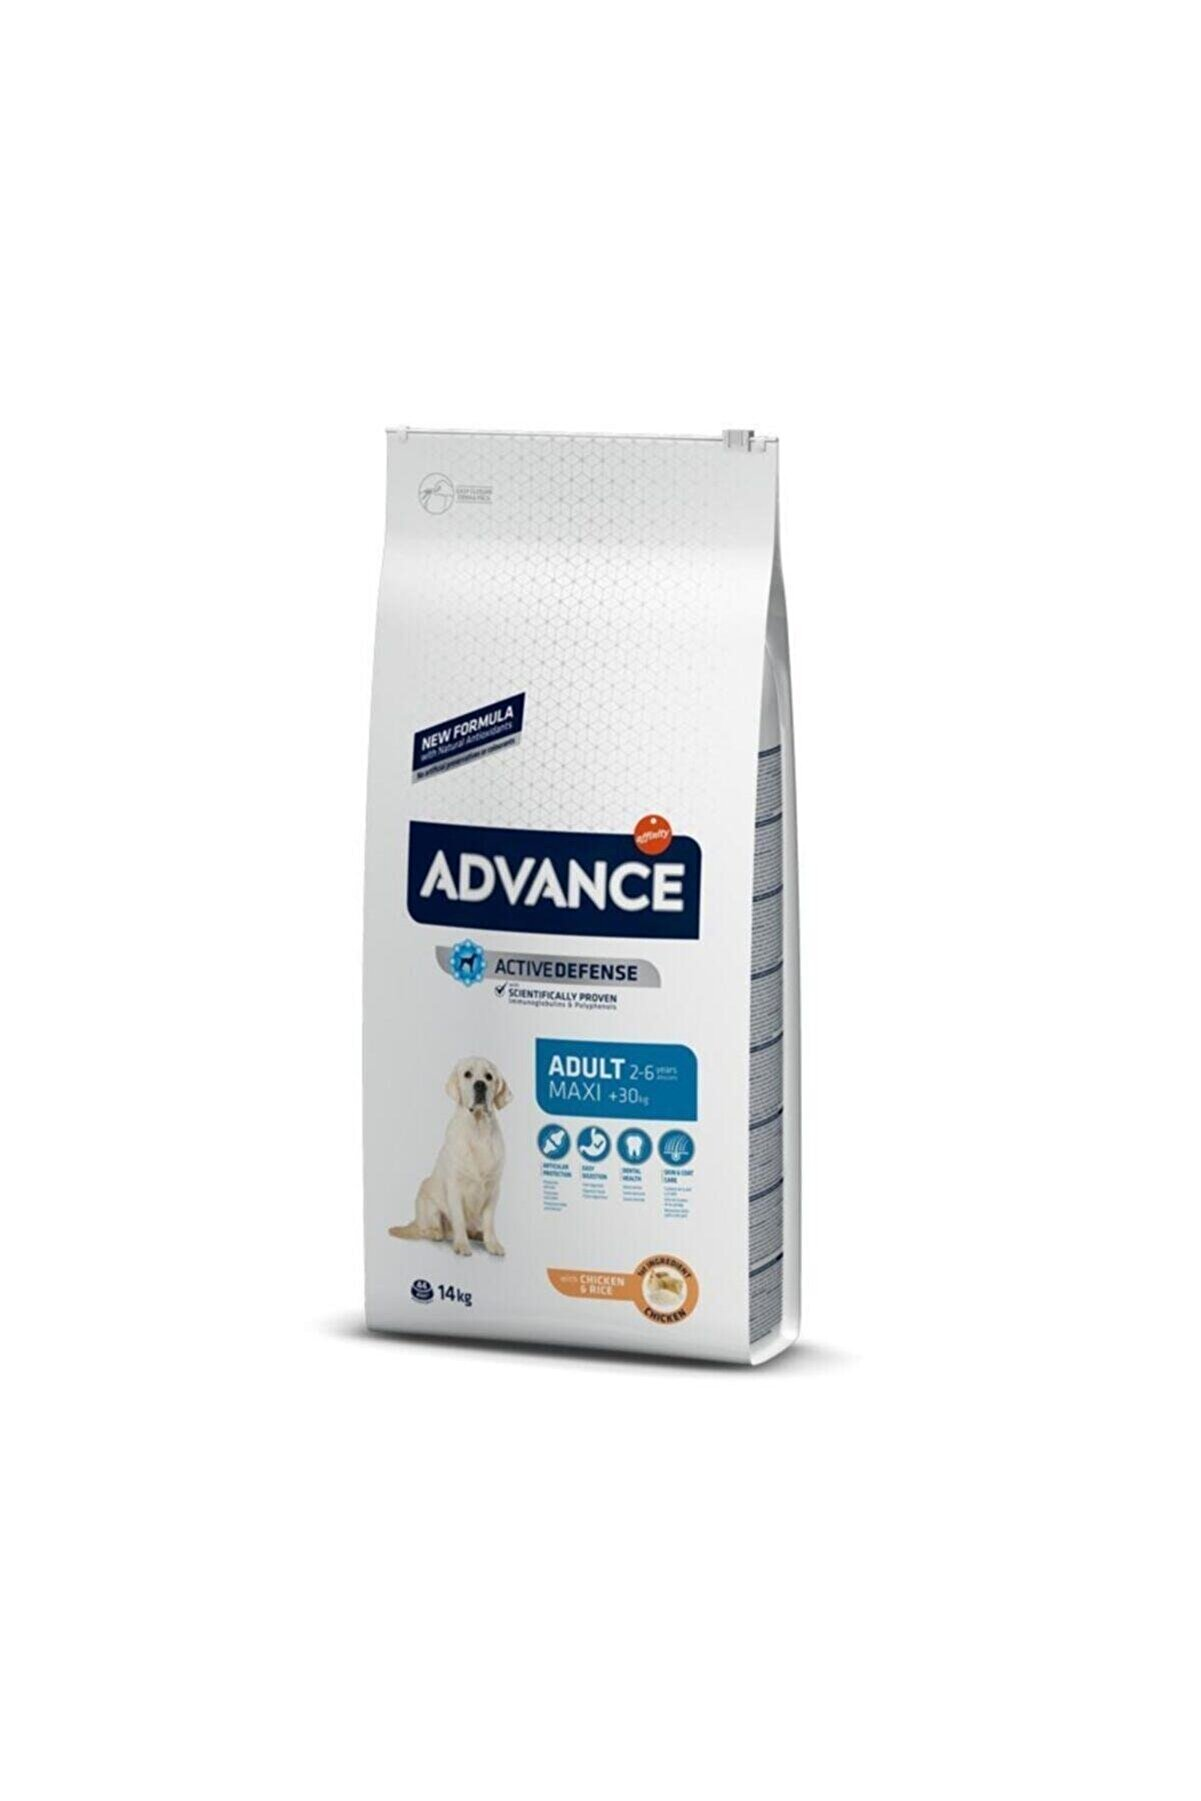 Advance Adult Maxi Tavuklu Büyük Irk Yetişkin Köpek Maması 14 Kg